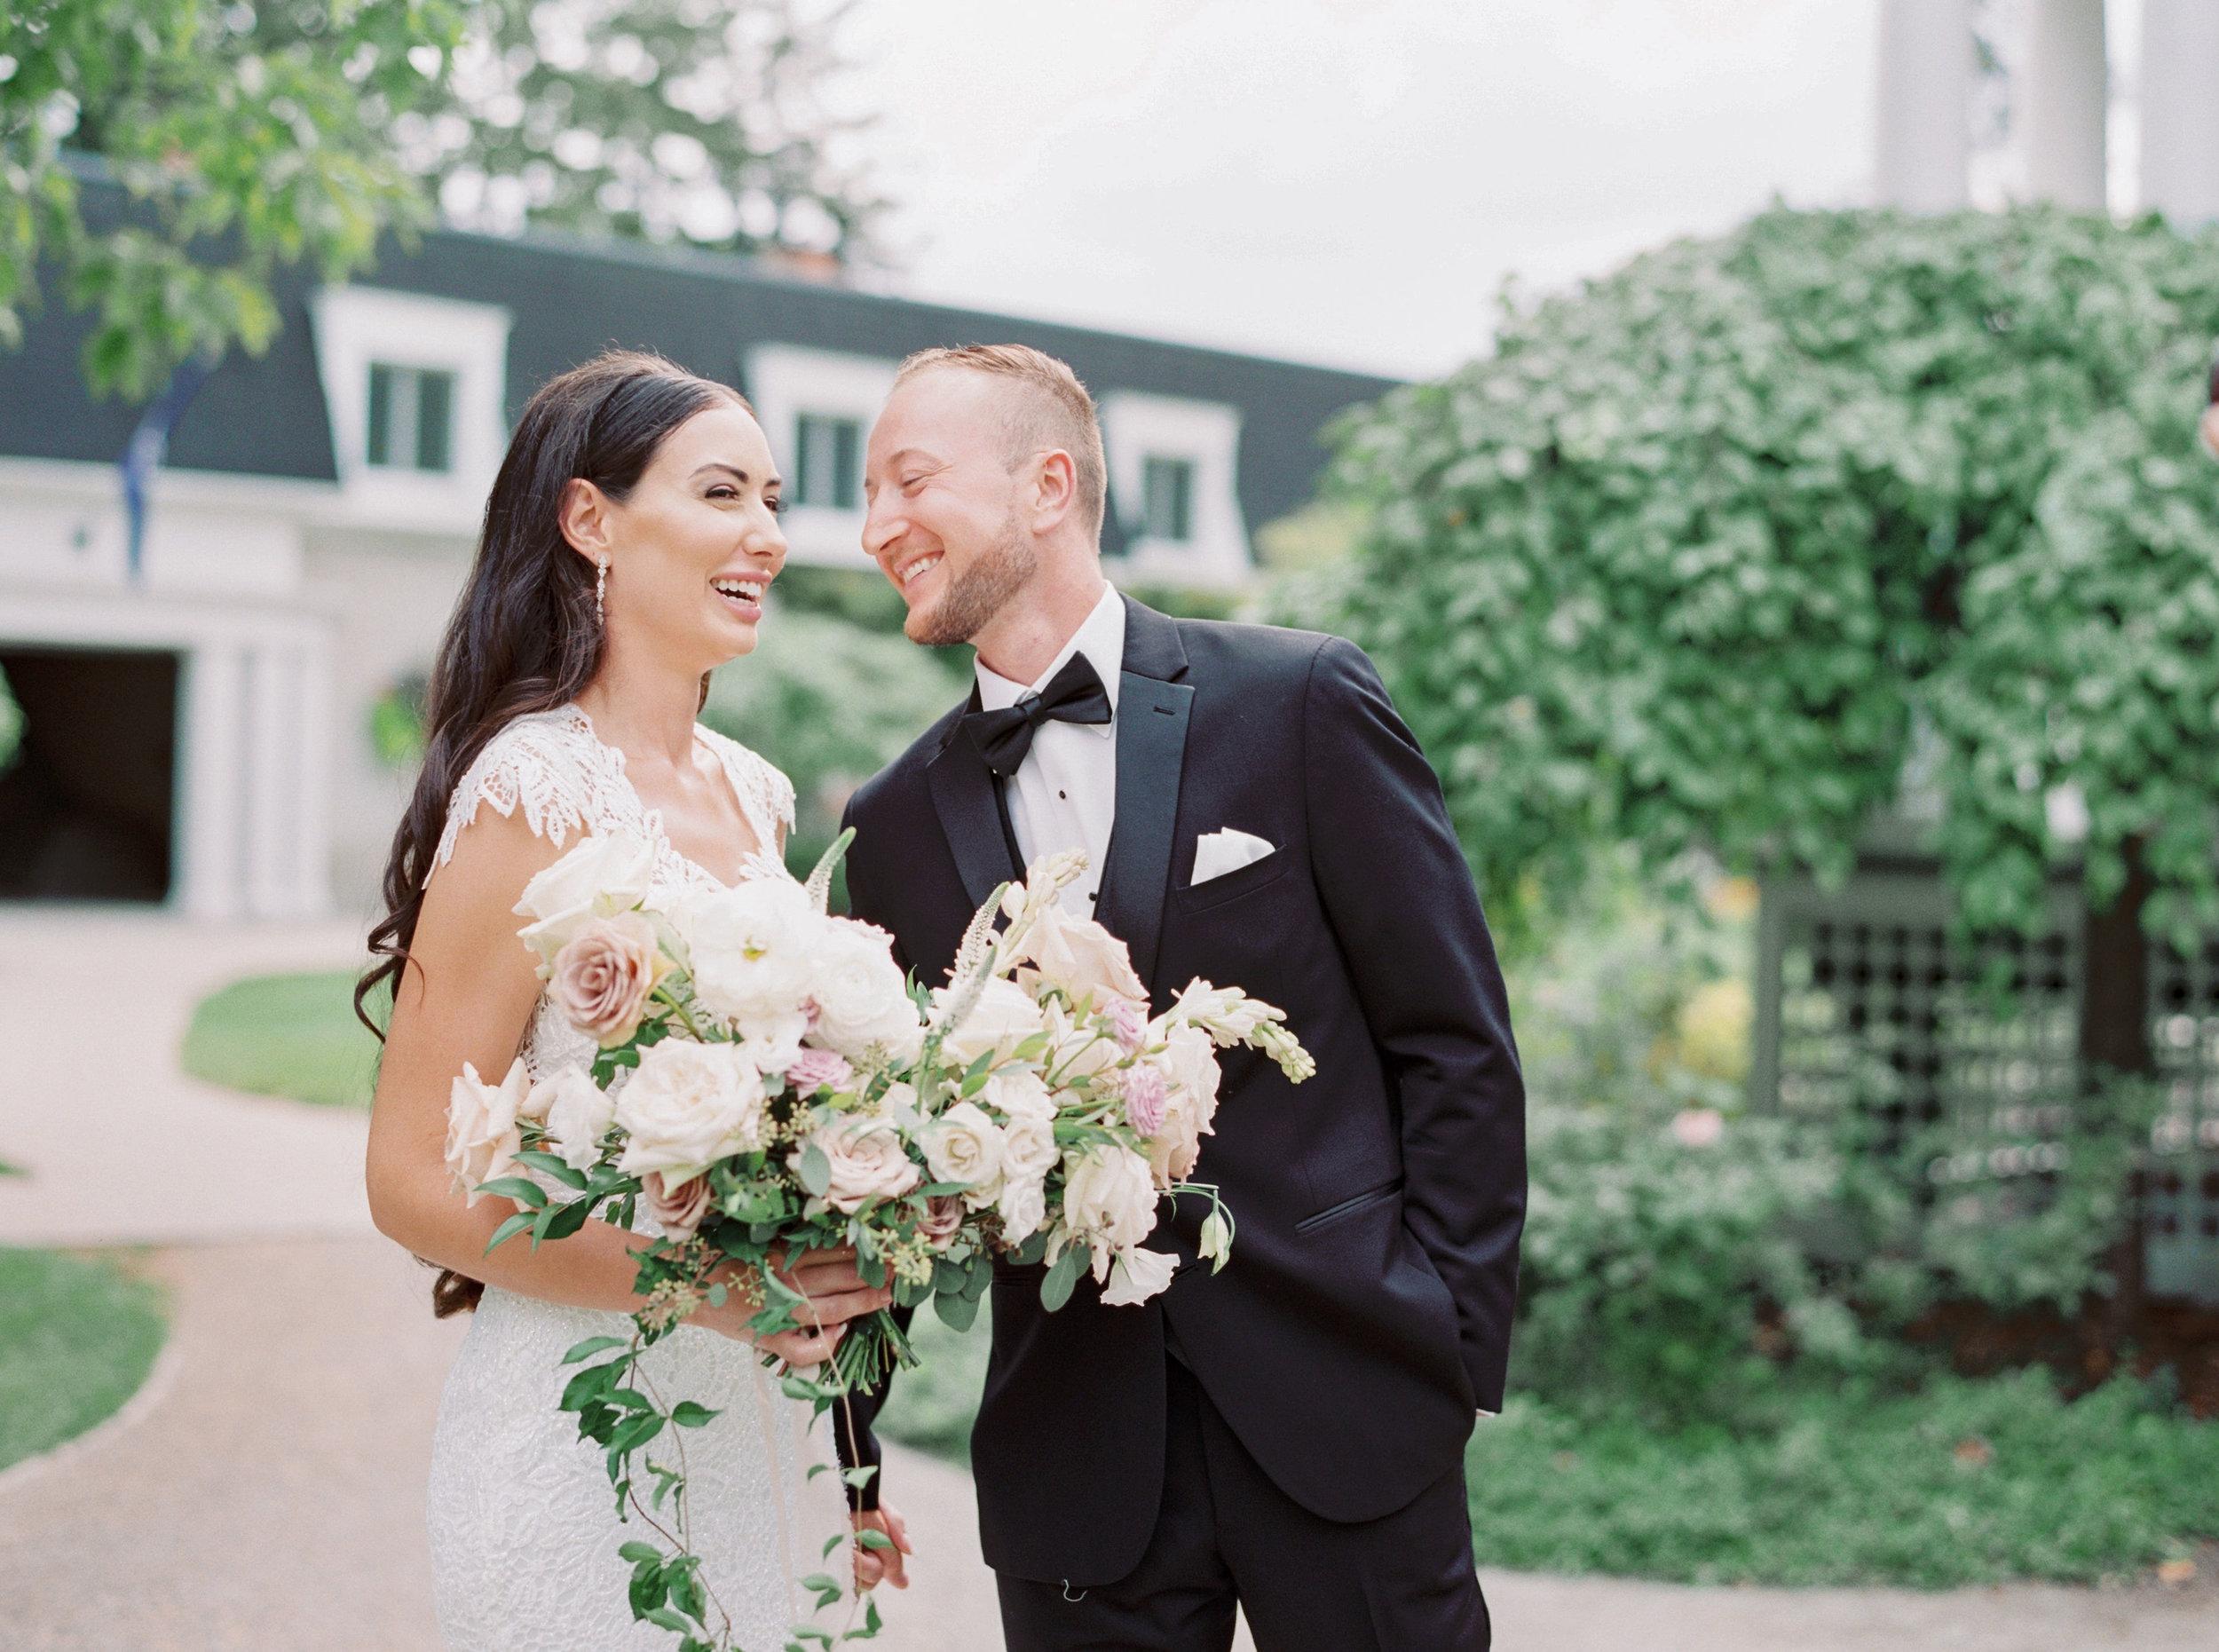 langdon-hall-wedding-toronto-photographer-soft-airy-kurtz-bre-tom-firshade-791.jpg